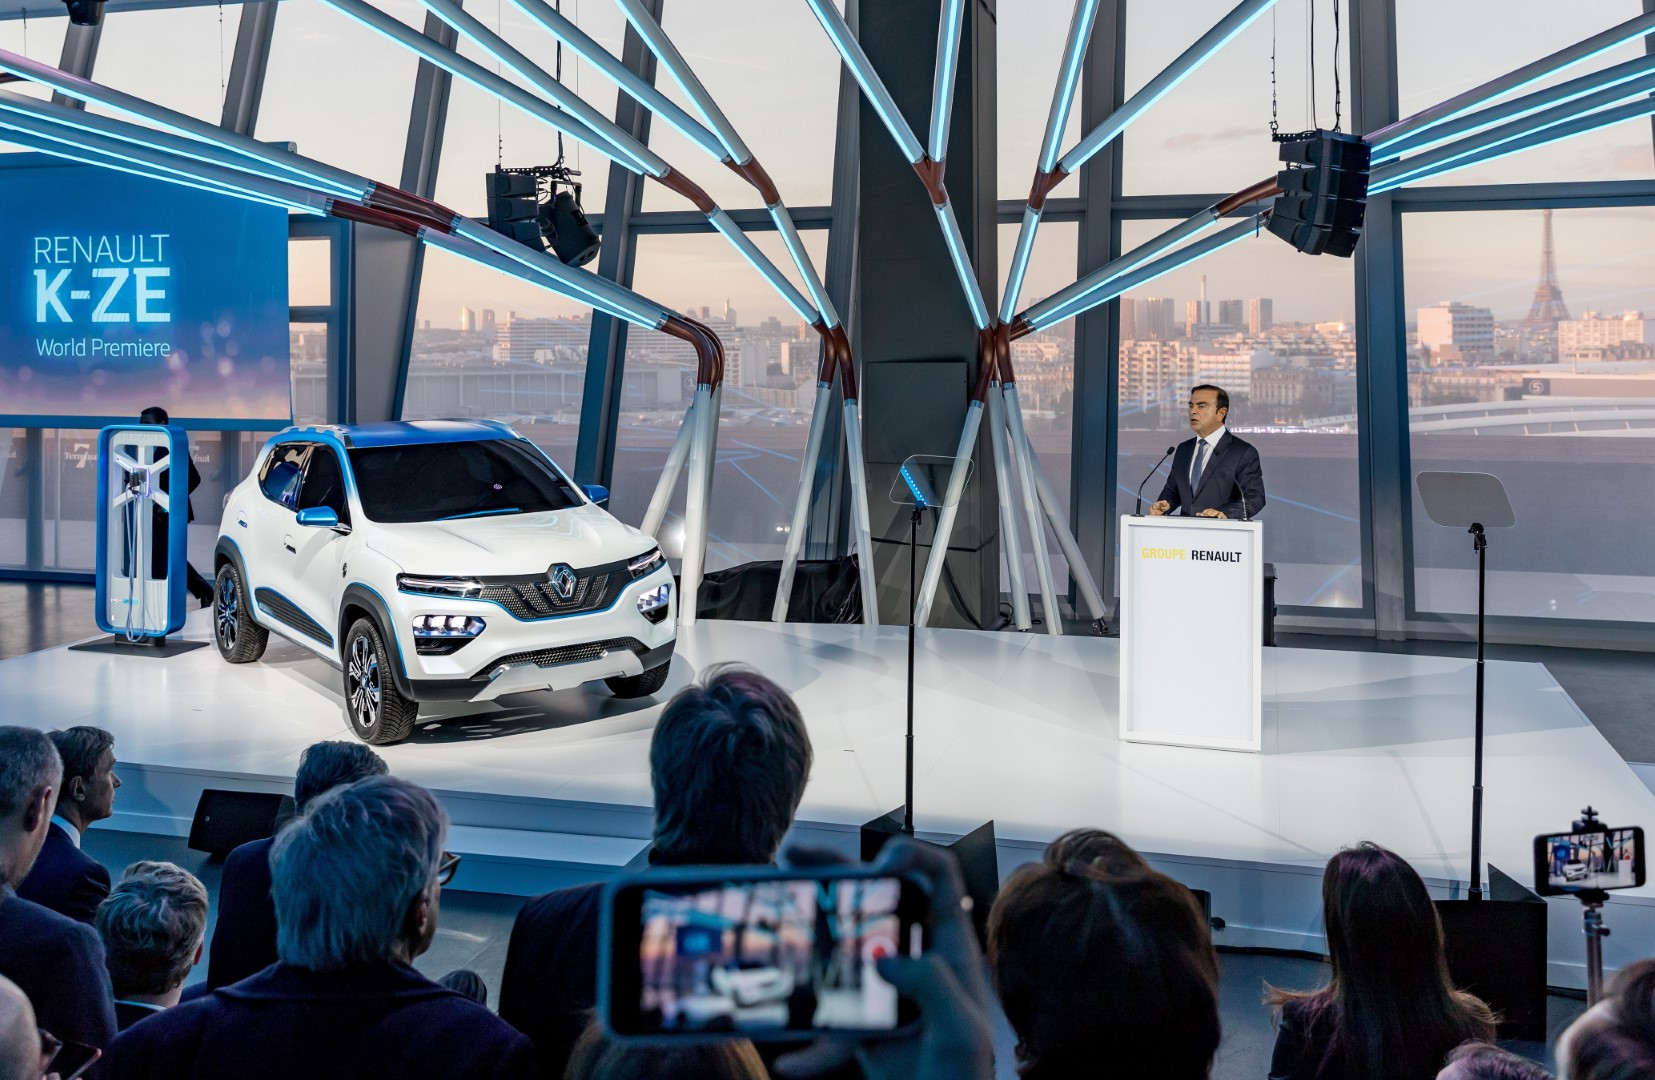 2018 Paris Motor Show: Renault K-ZE Concept